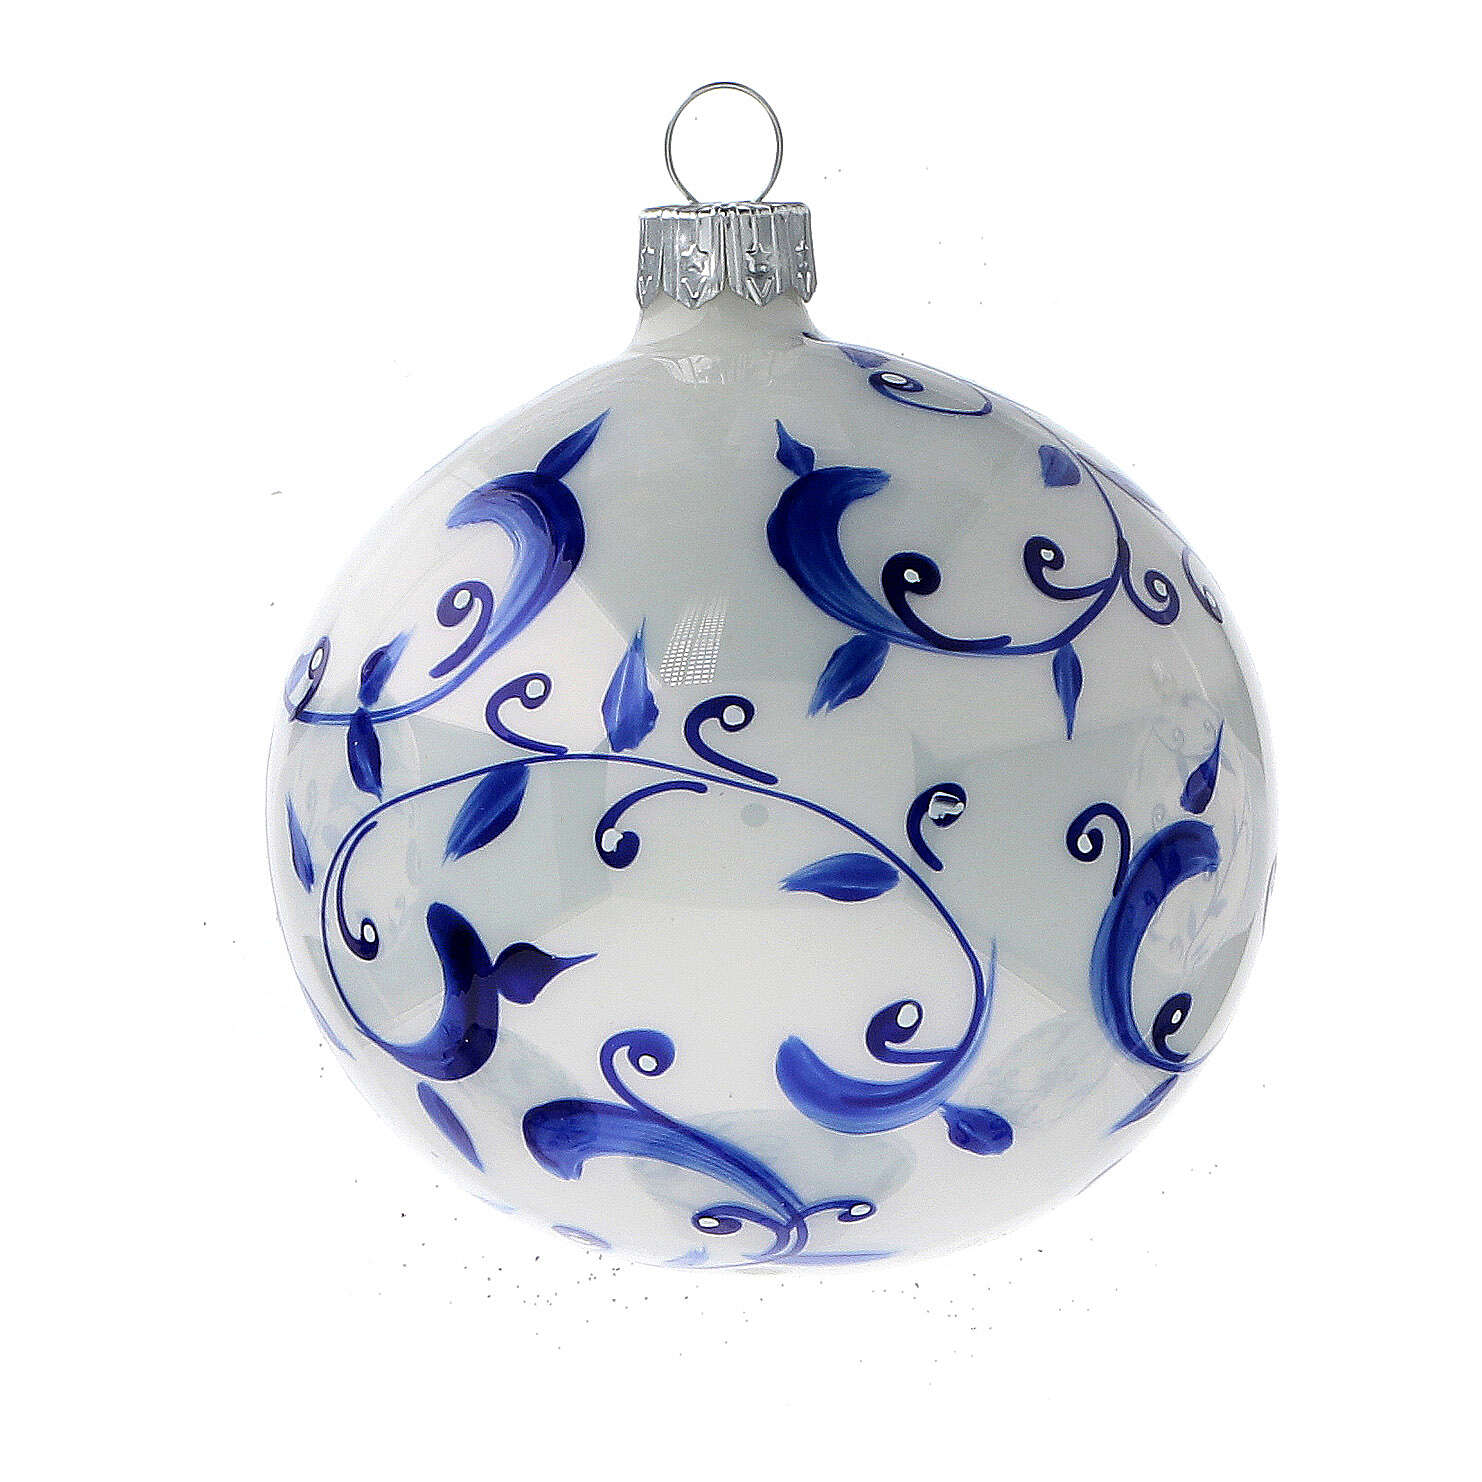 Bolas árvore de Natal vidro soprado branco com ramos azuis 80 mm 6 unidades 4